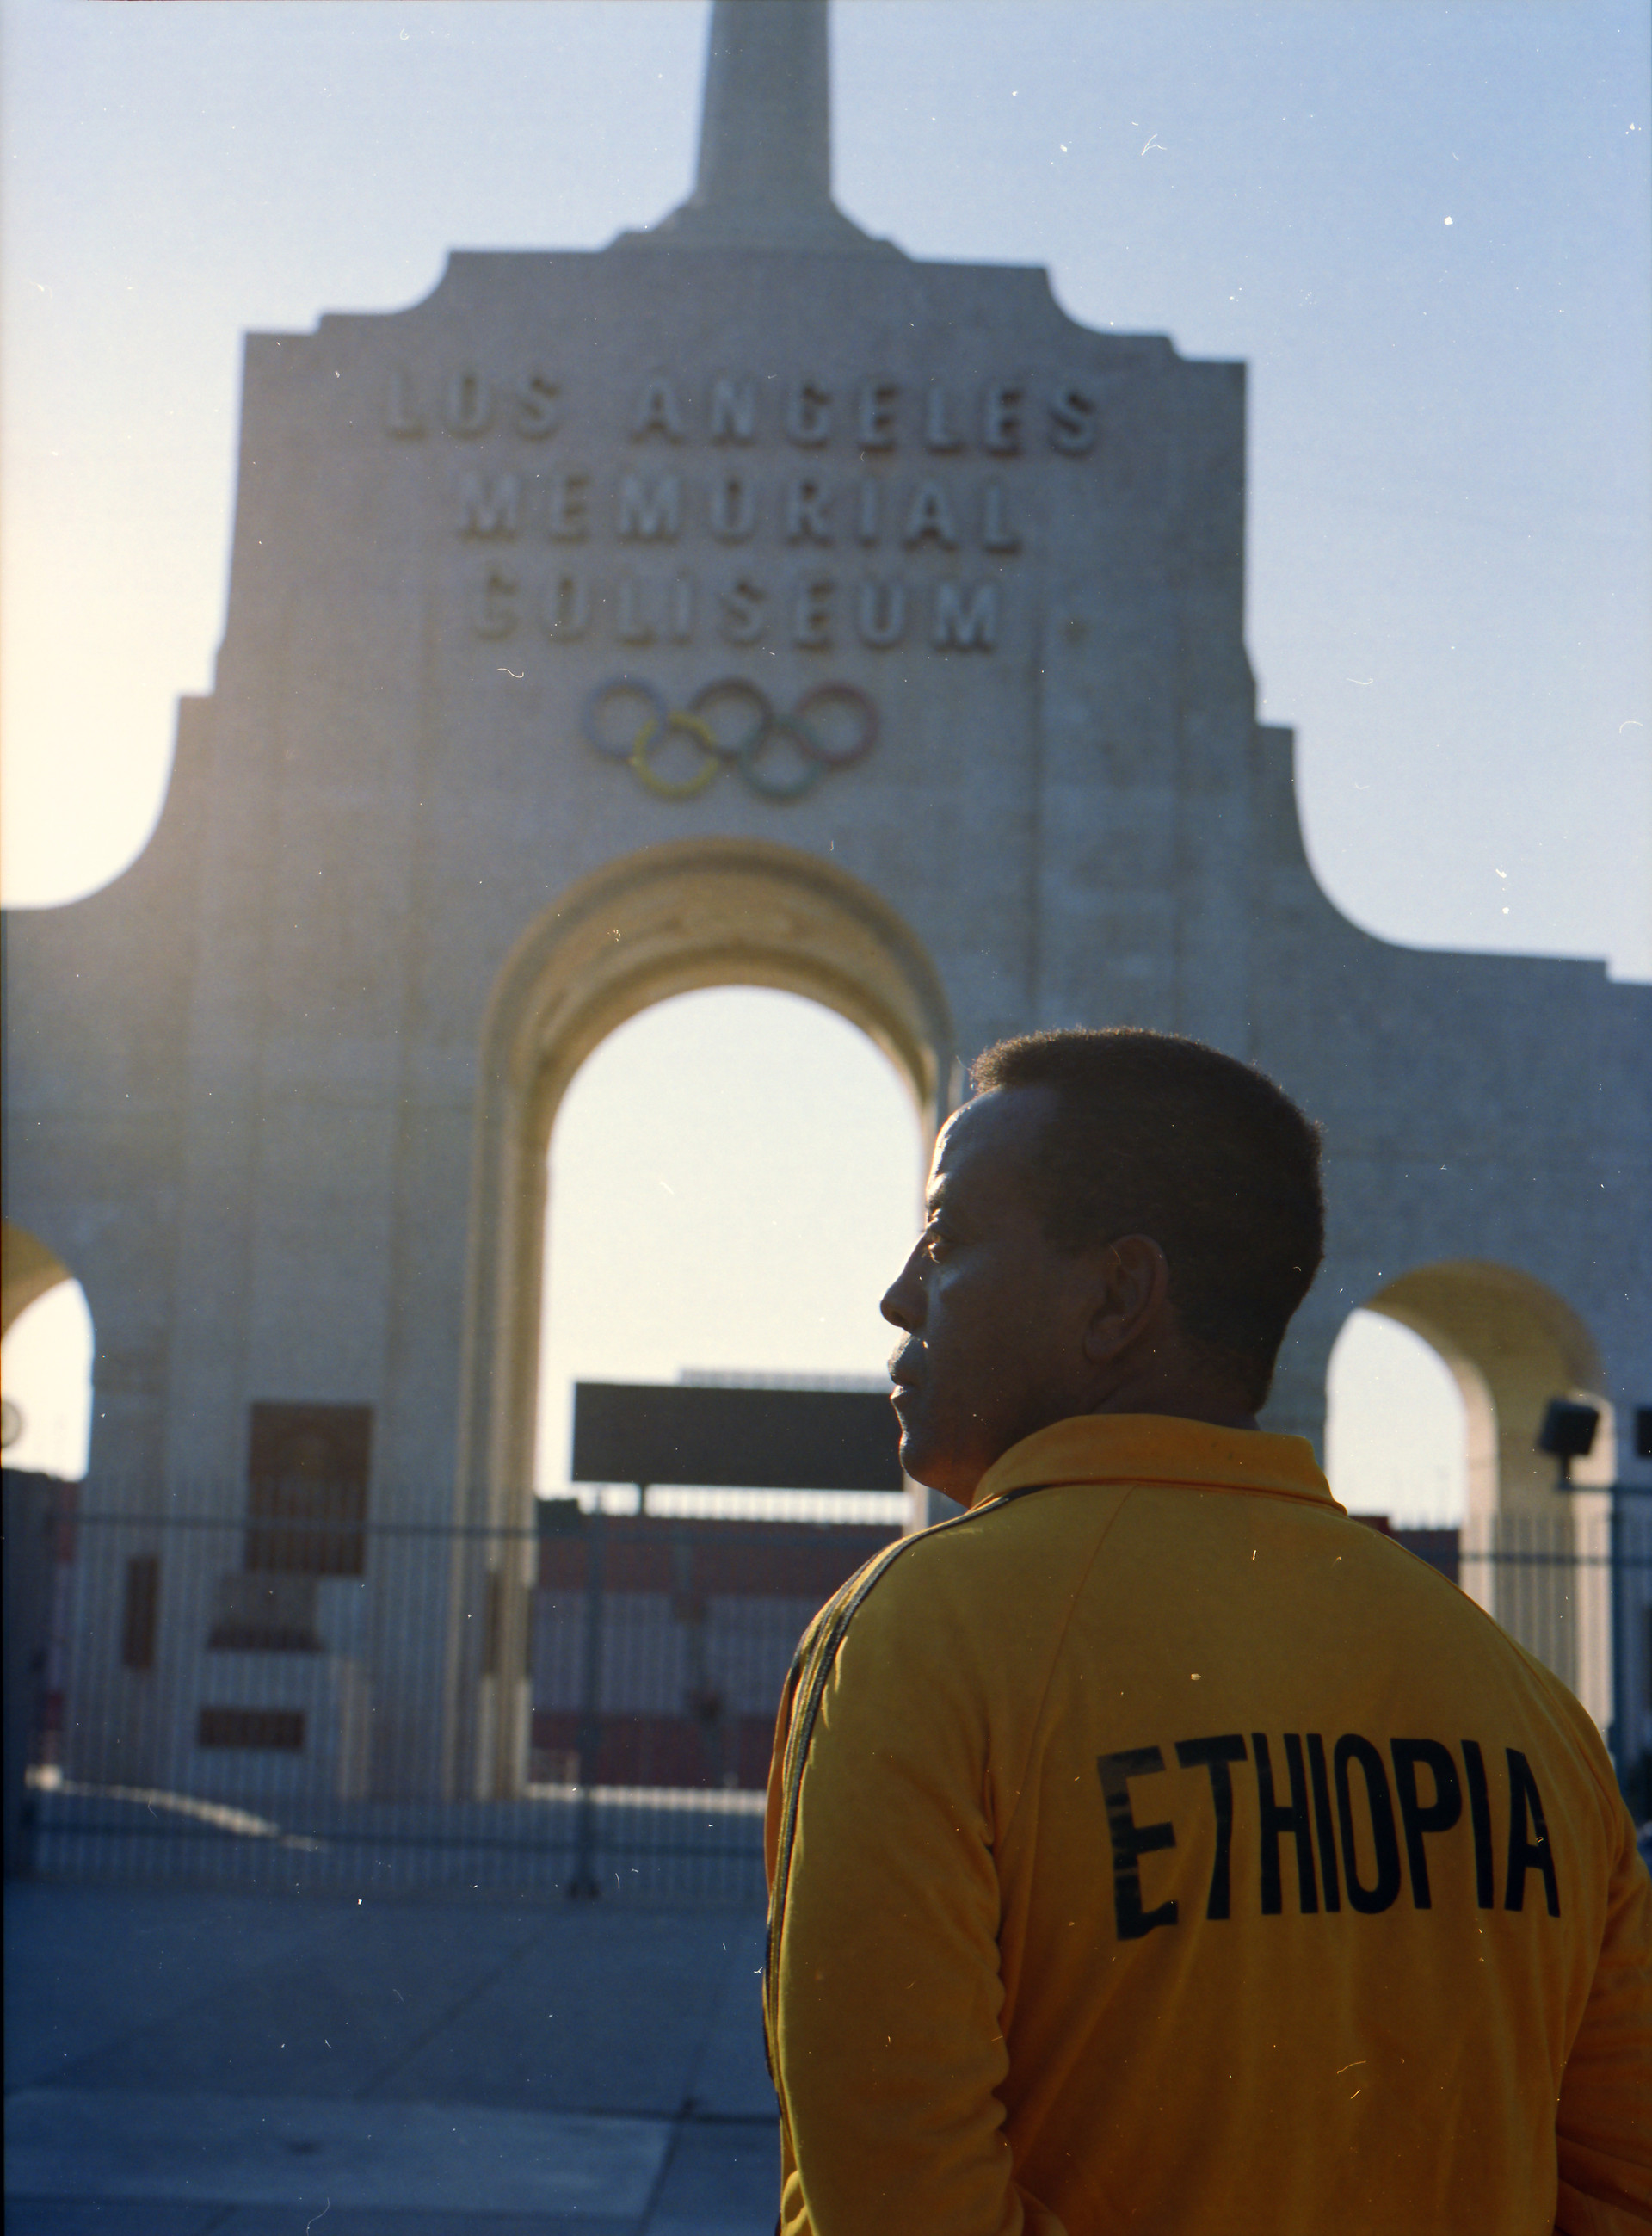 Seb Zewdie - Los Angeles Memorial Coliseum